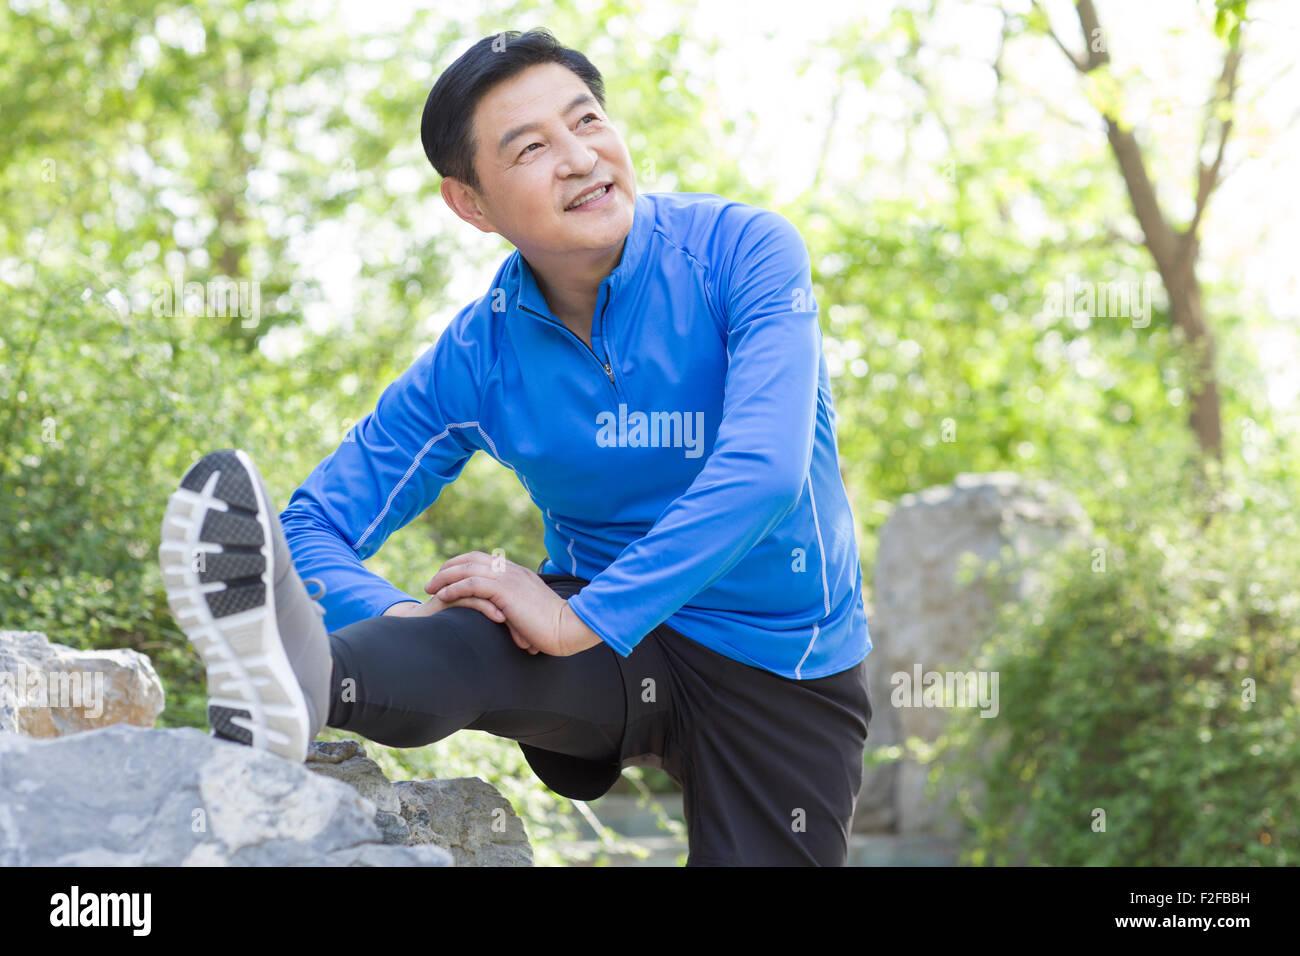 Happy mature man exercising in park - Stock Image